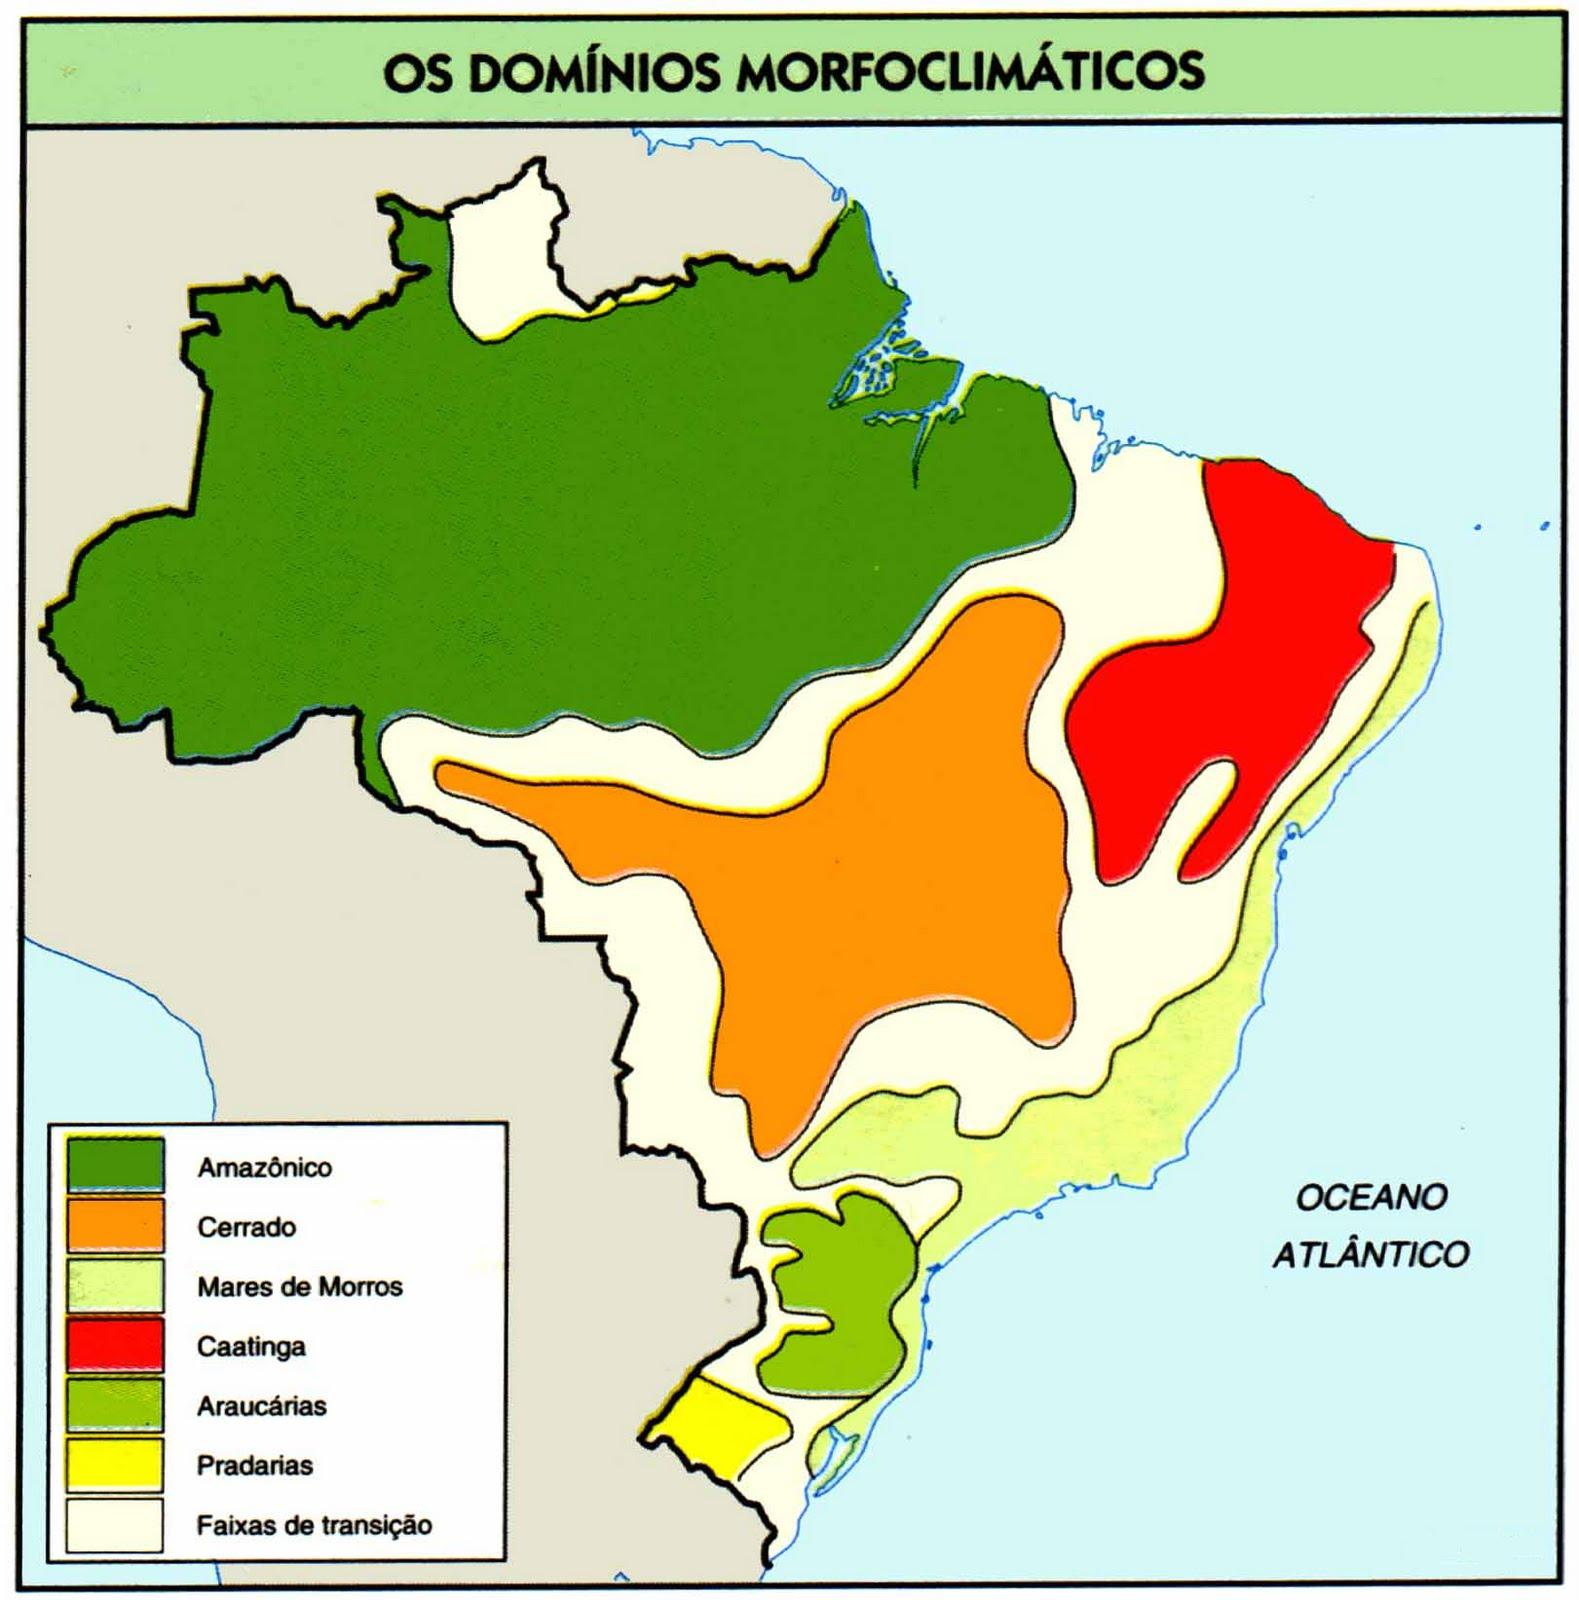 Os domínios morfoclimáticos brasileiros